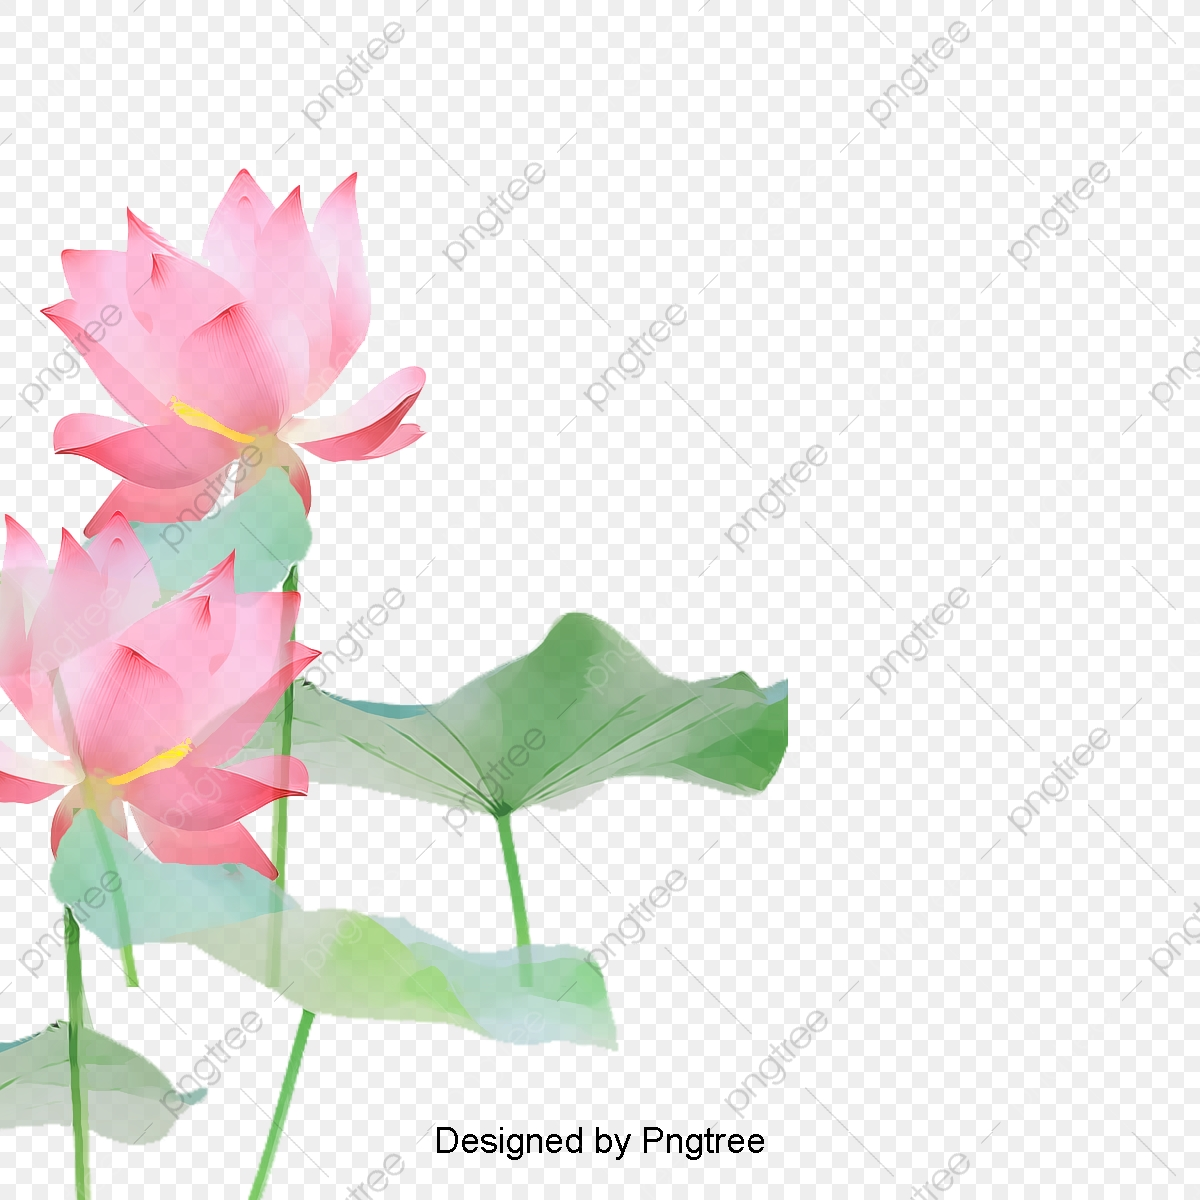 Lotus Flowers Lotus Clipart Flowers Lotus Png Transparent Image